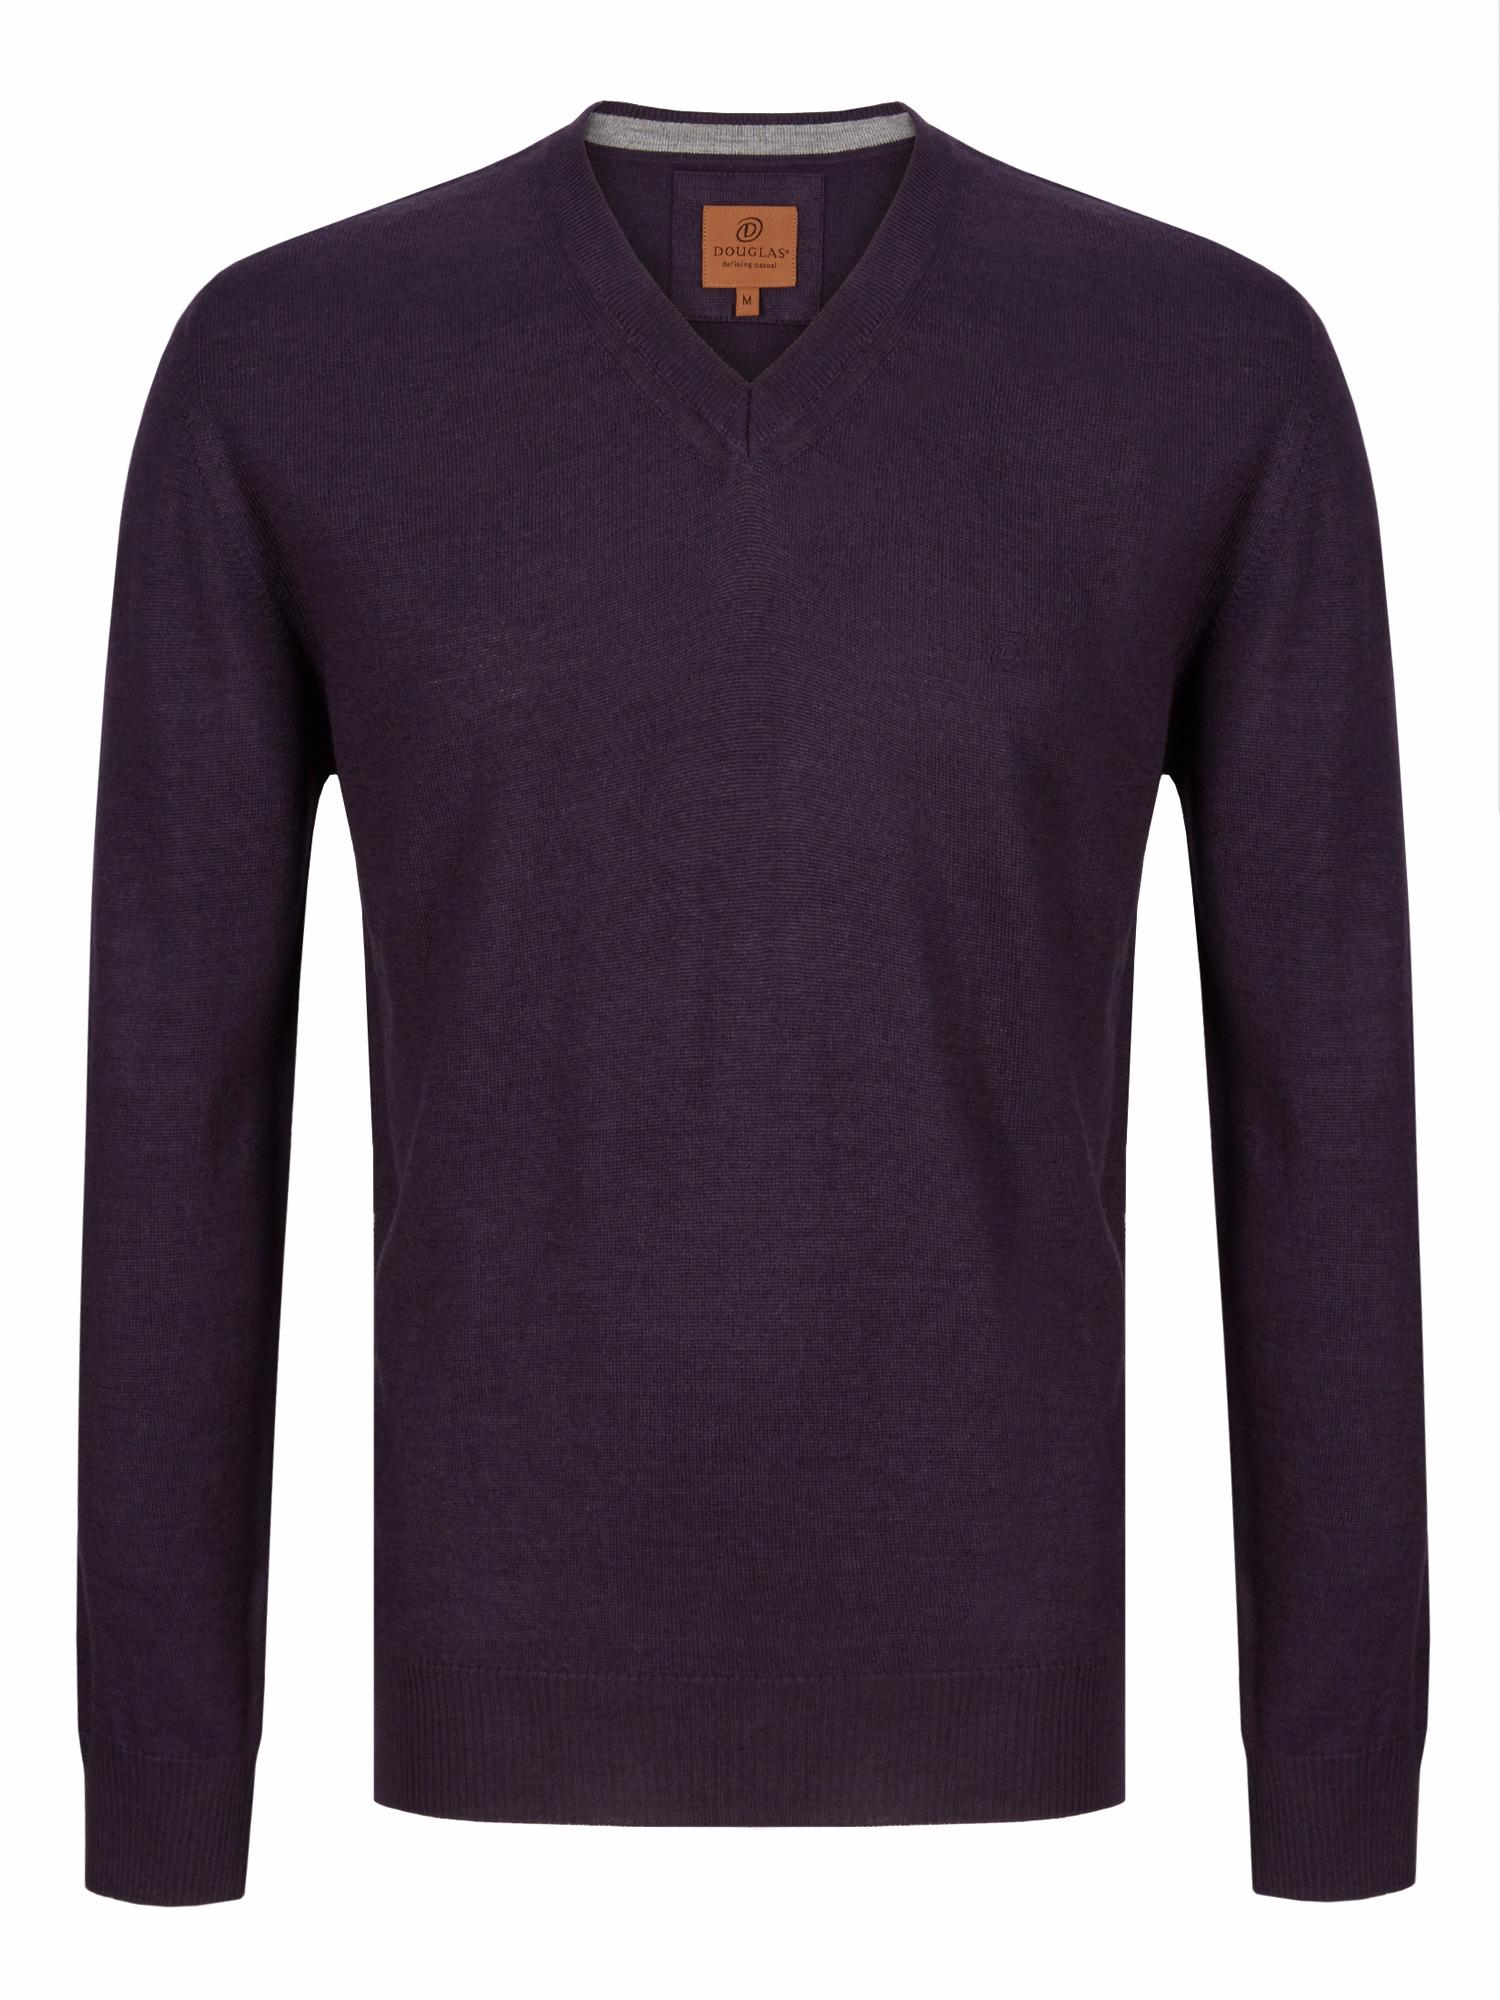 Douglas purple v neck sweater 56199/76 - Brooks Shops